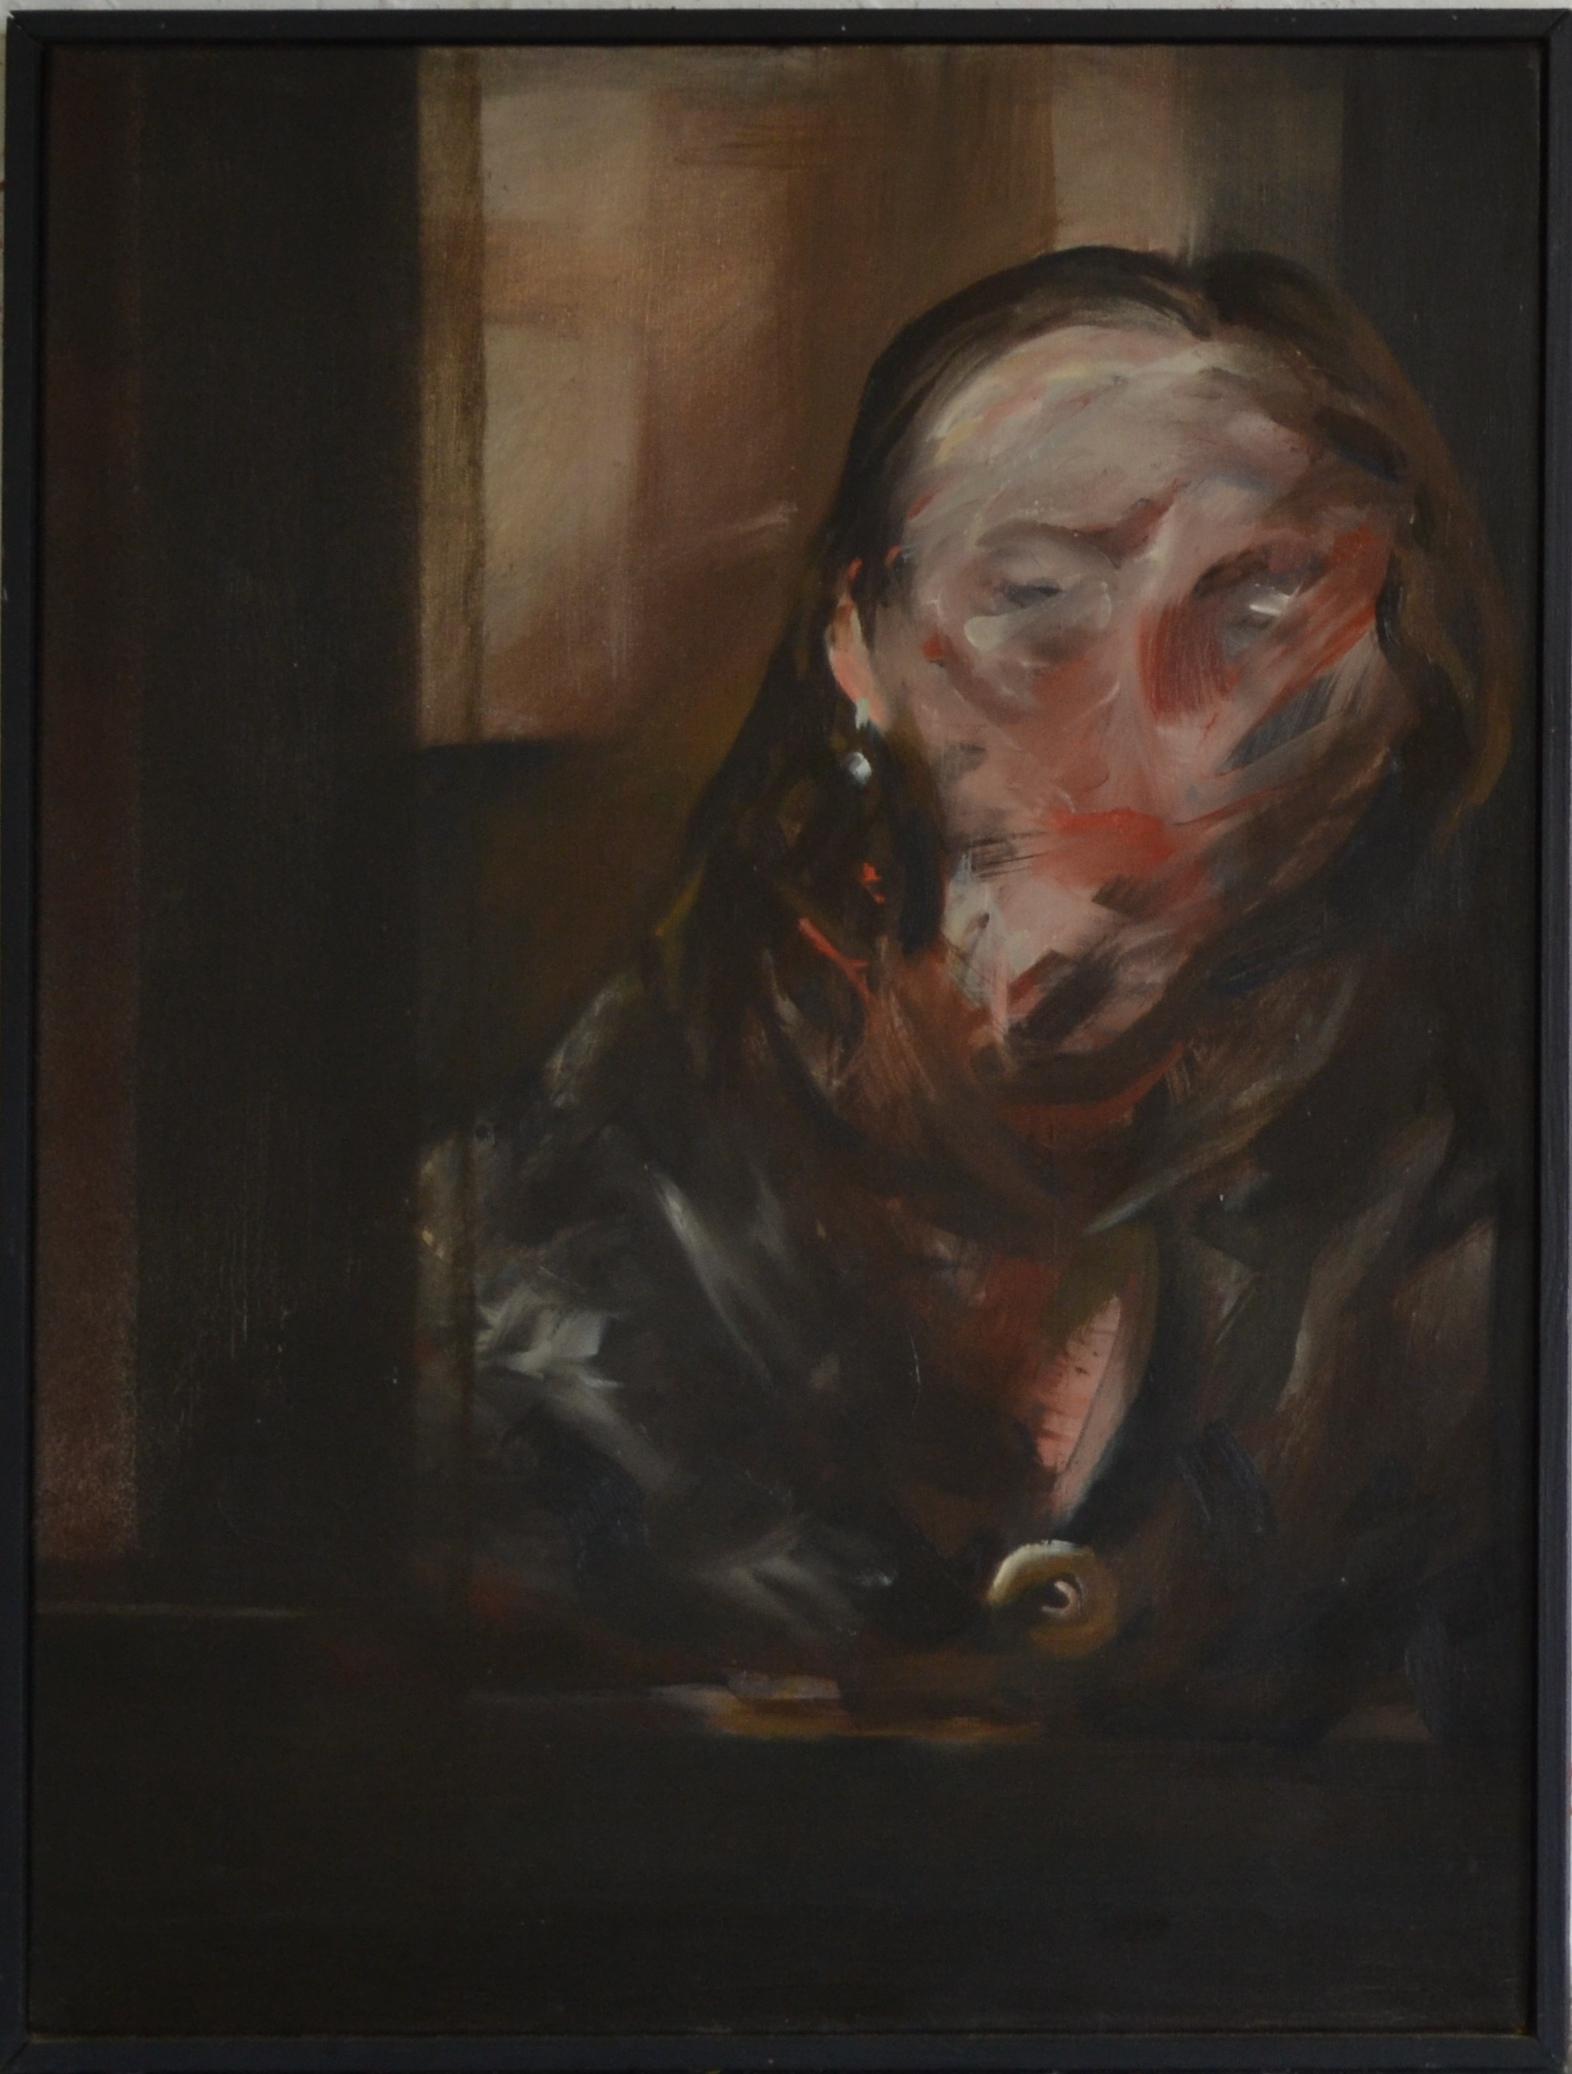 huile sur toile/chassis, 63 x 48 cm, 1981